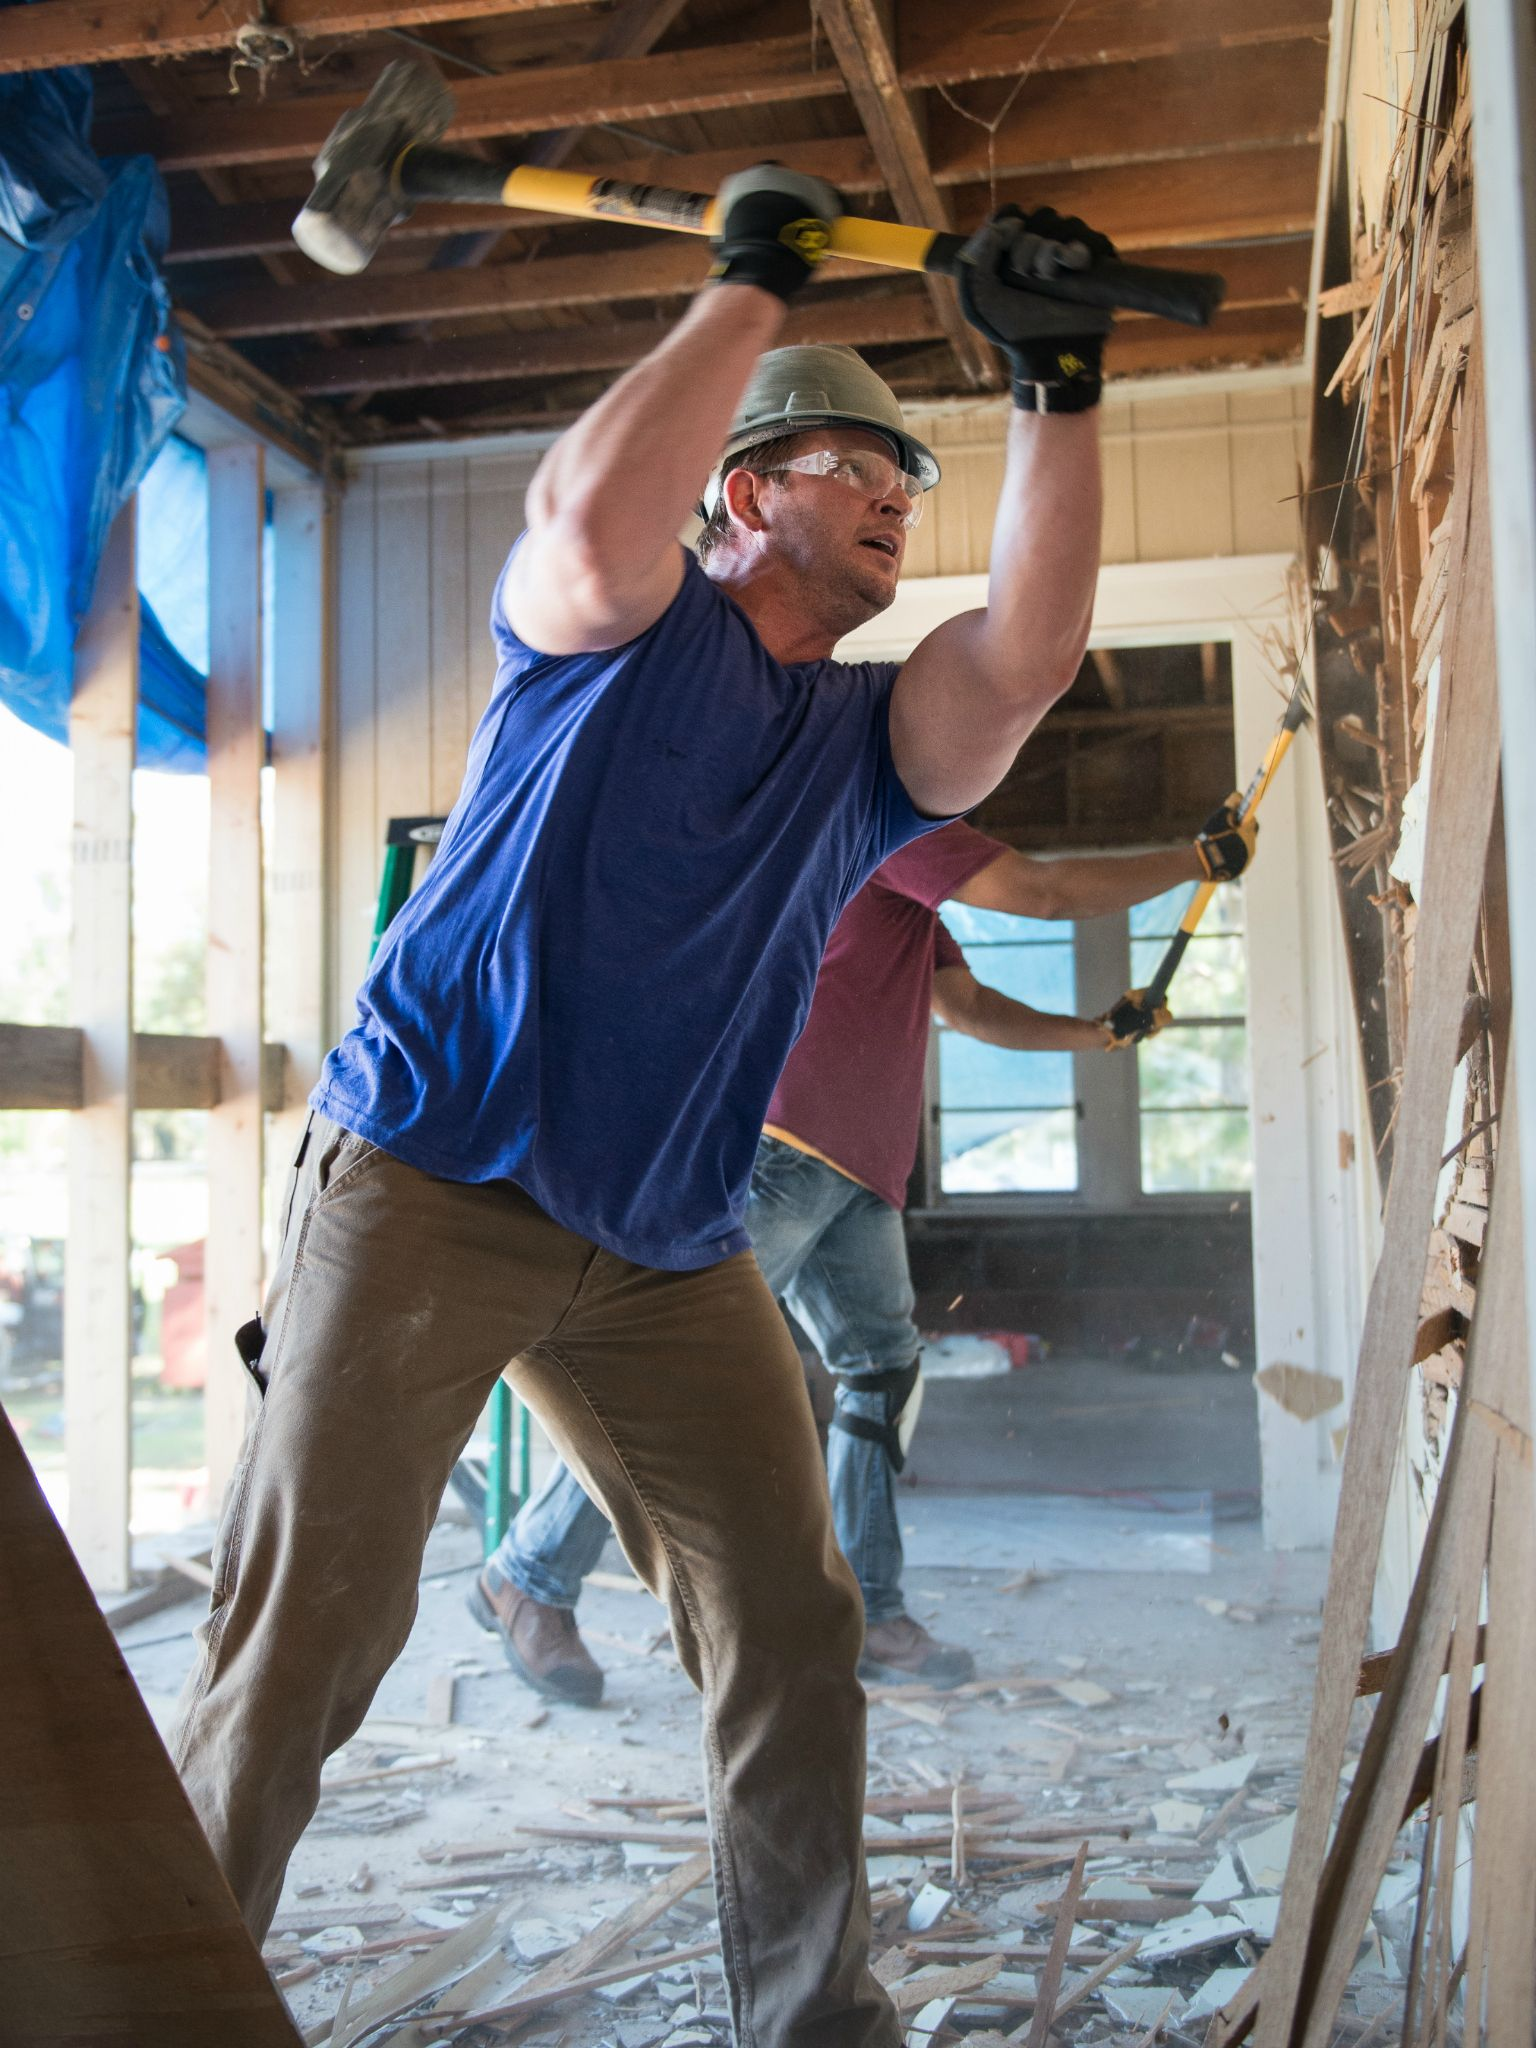 Jason Cameron Smashes Things With a Sledgehammer Jason